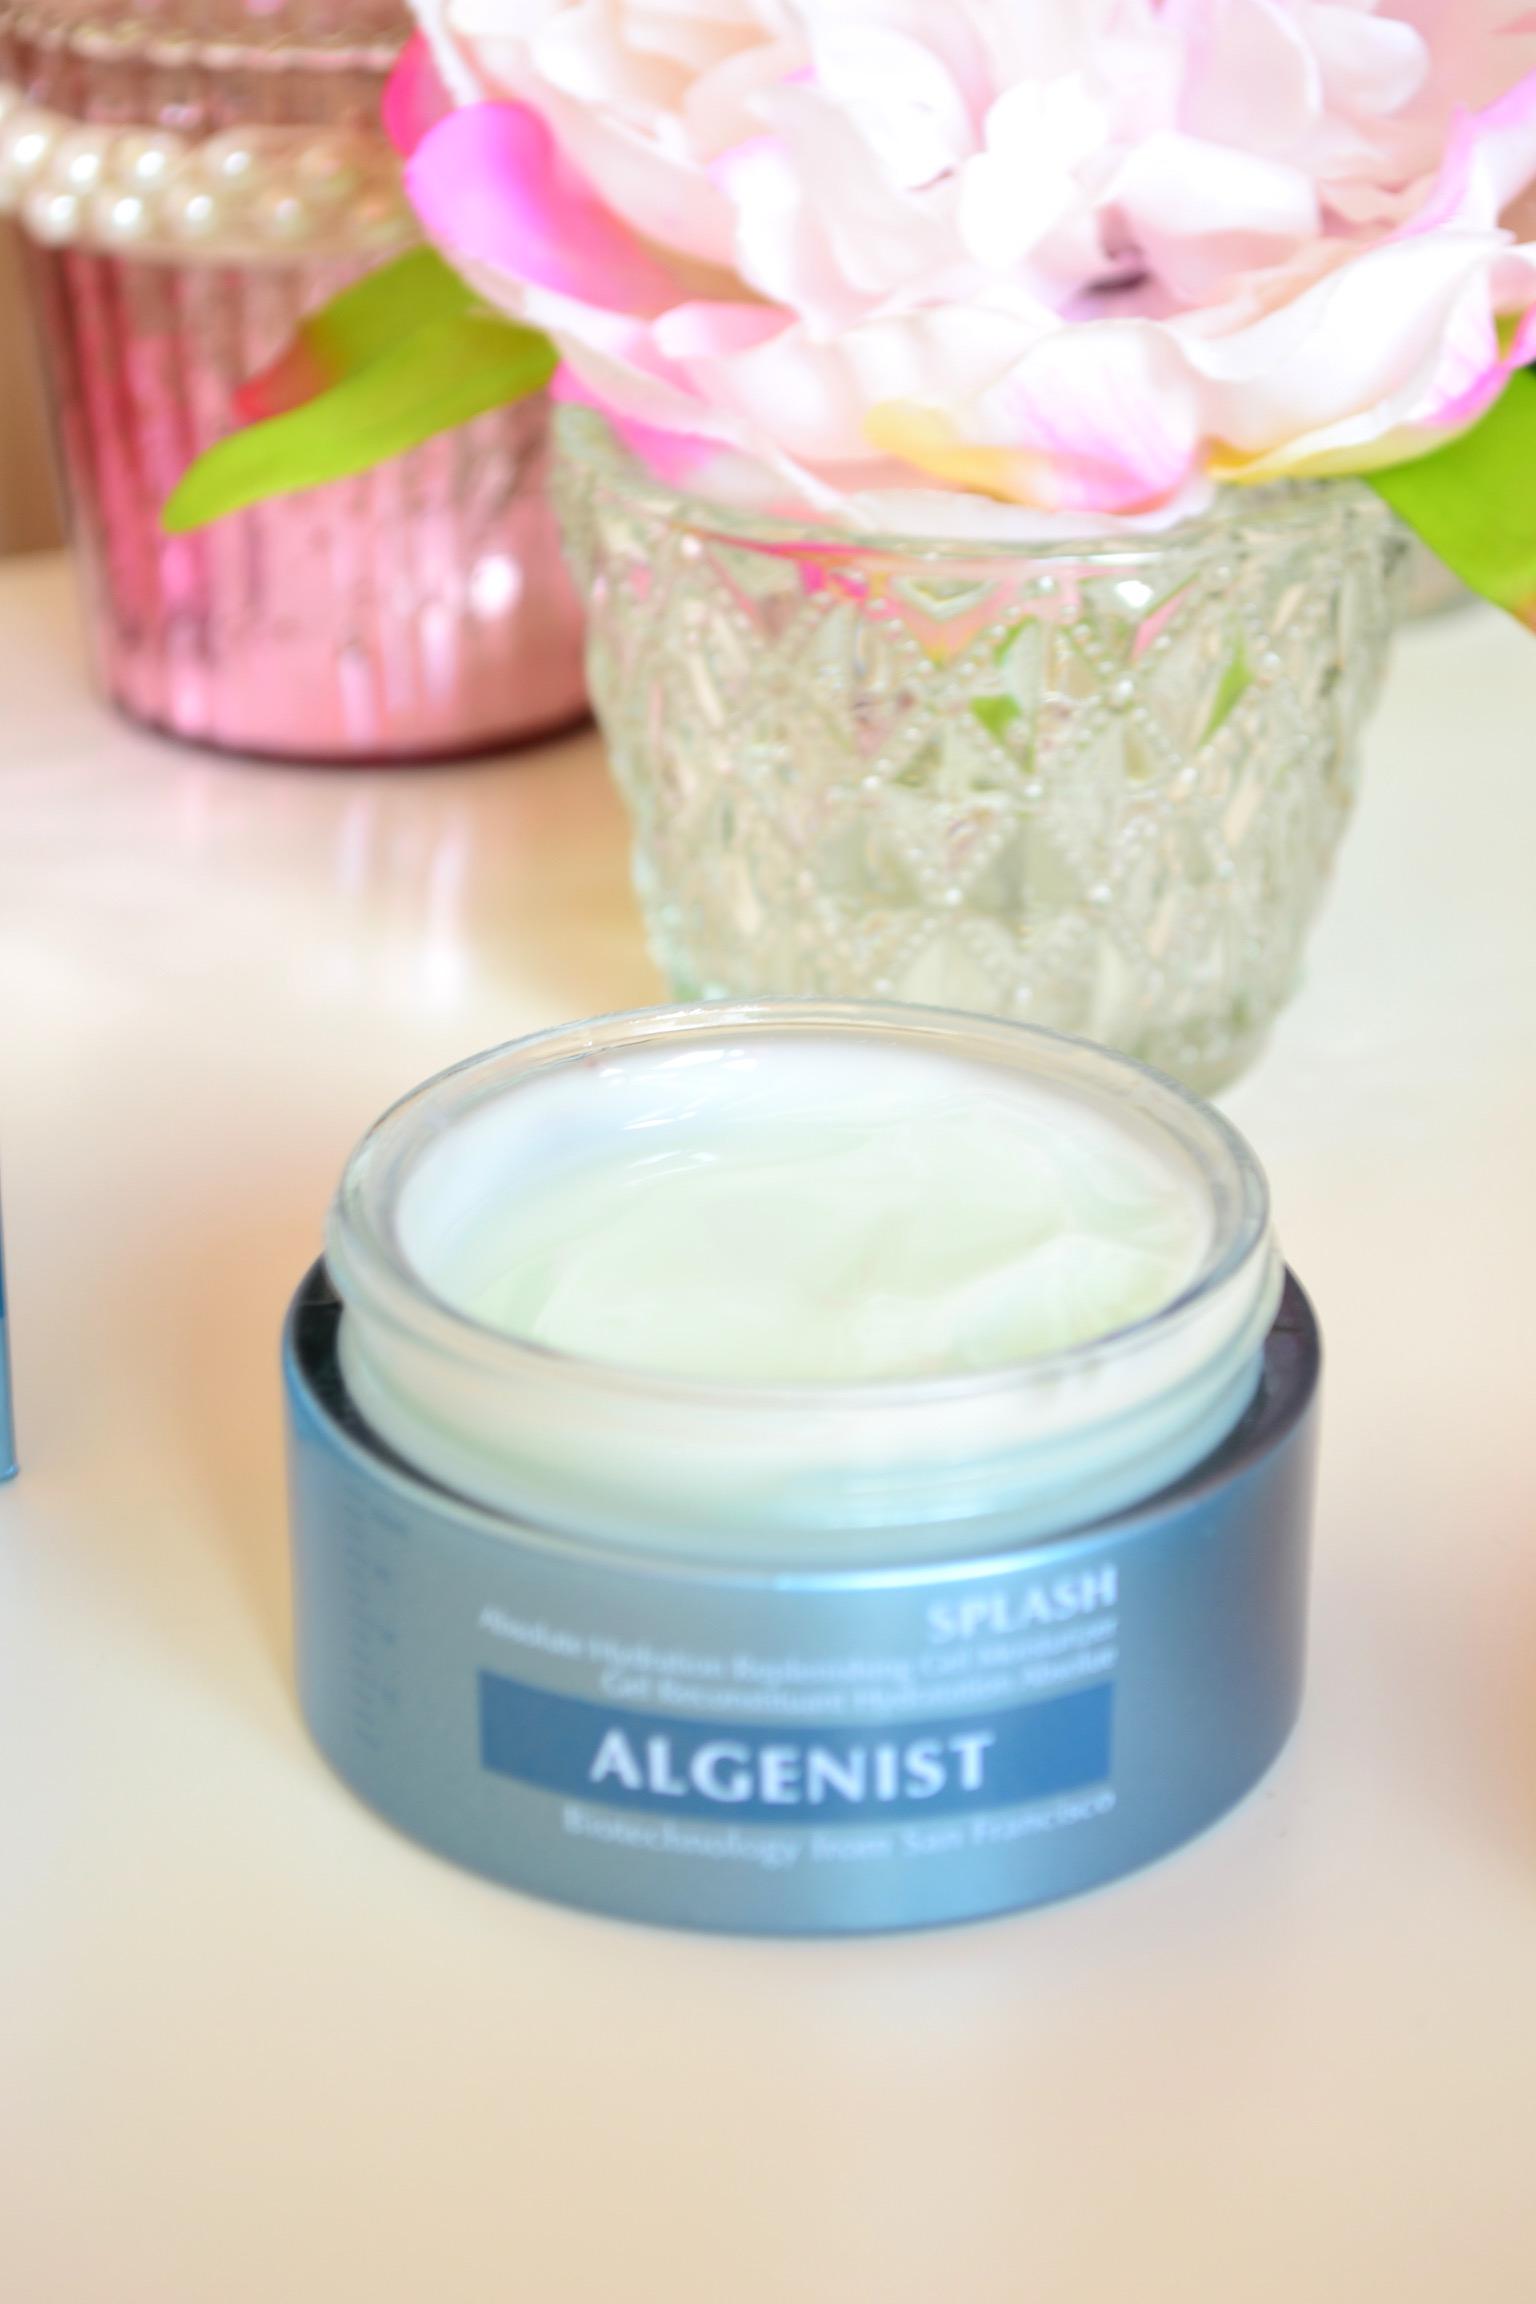 algenist-moisturiser-review